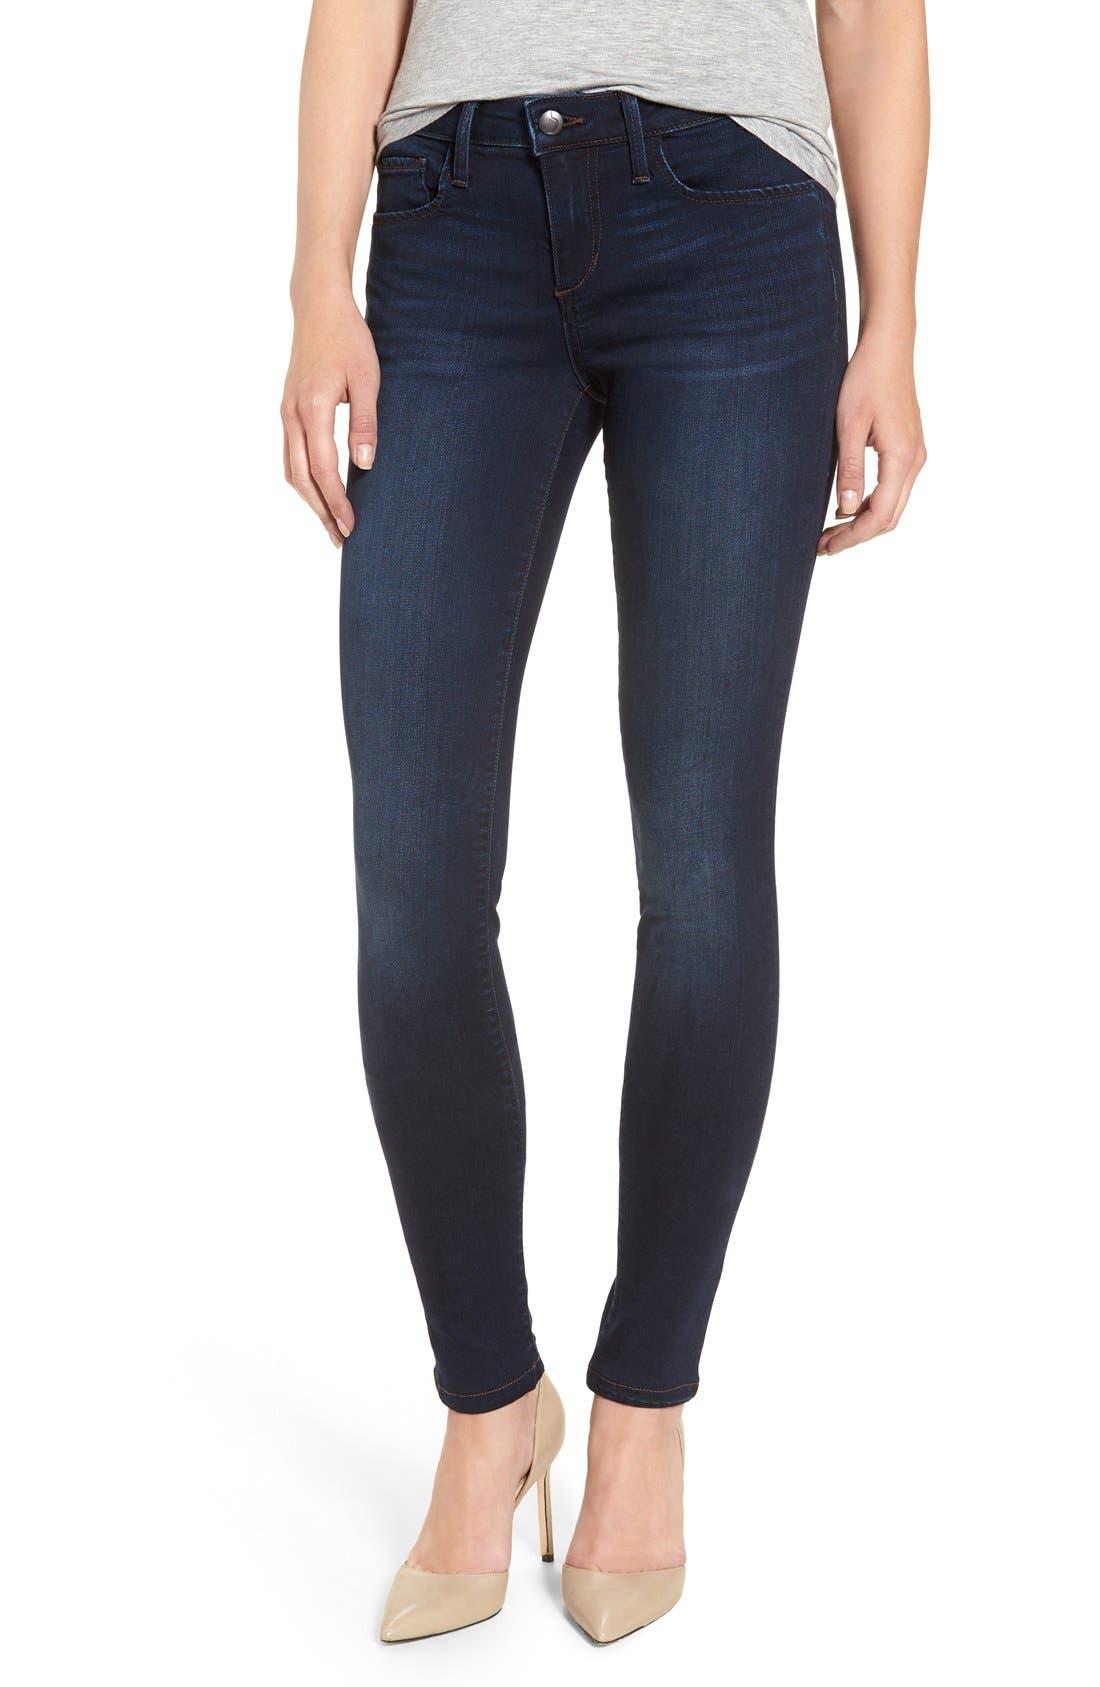 JOE'S 'Flawless - Twiggy' Skinny Jeans